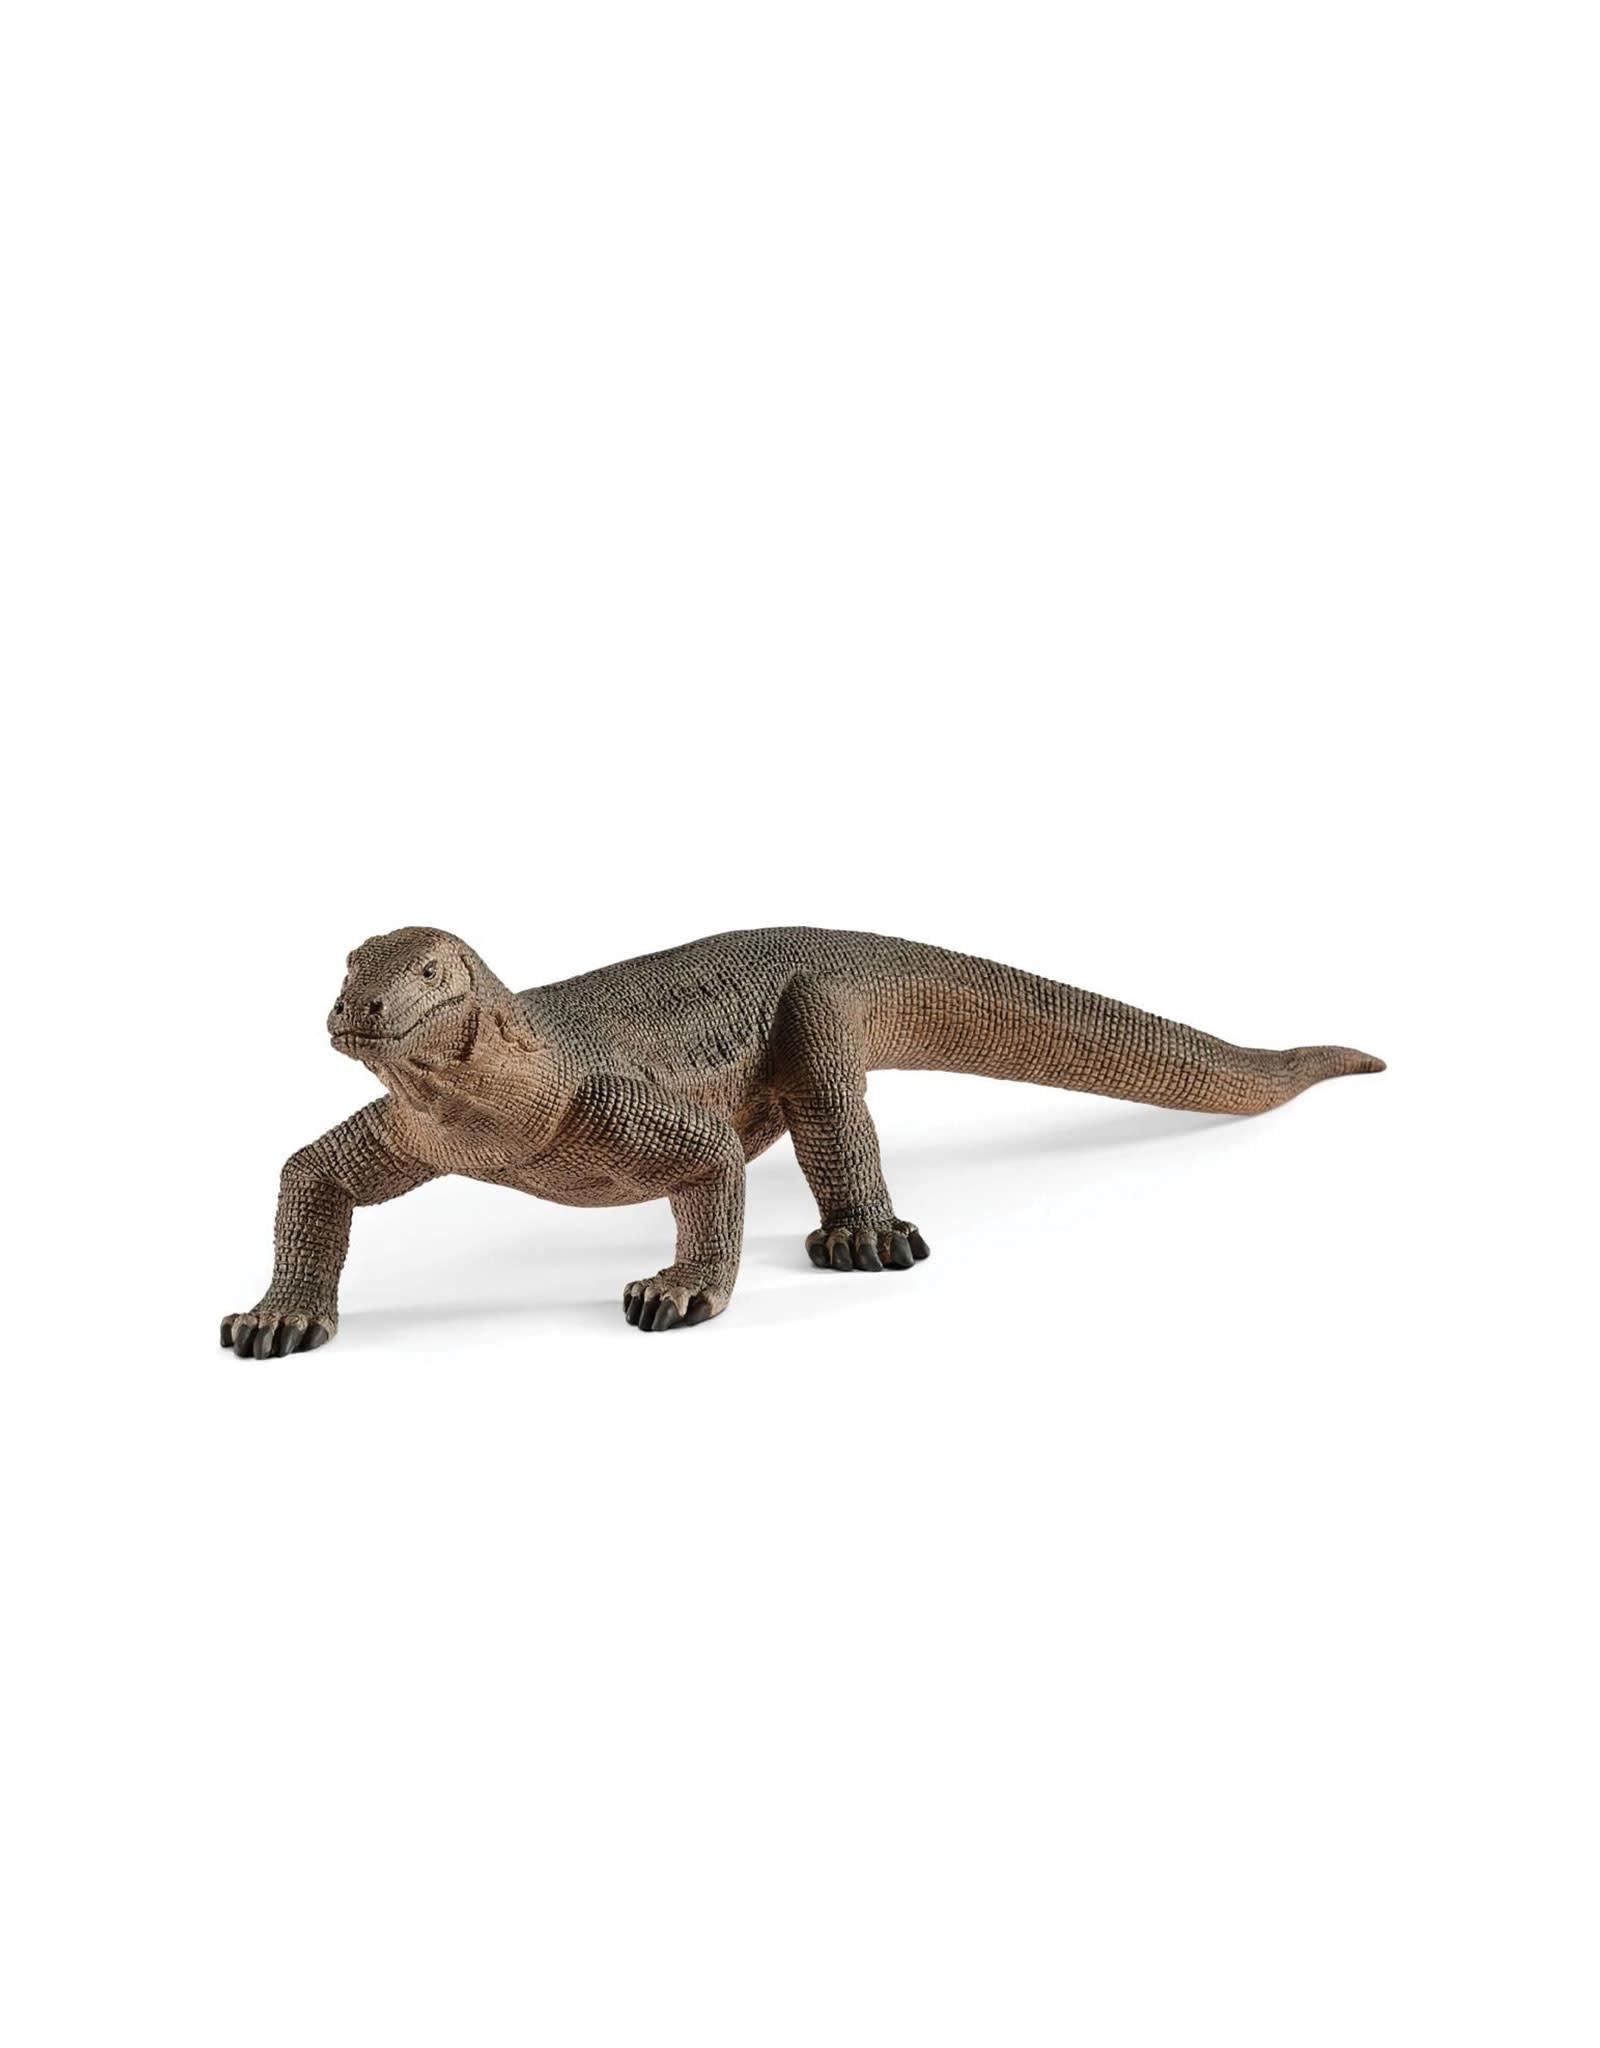 Schleich Animal - Komodo Dragon